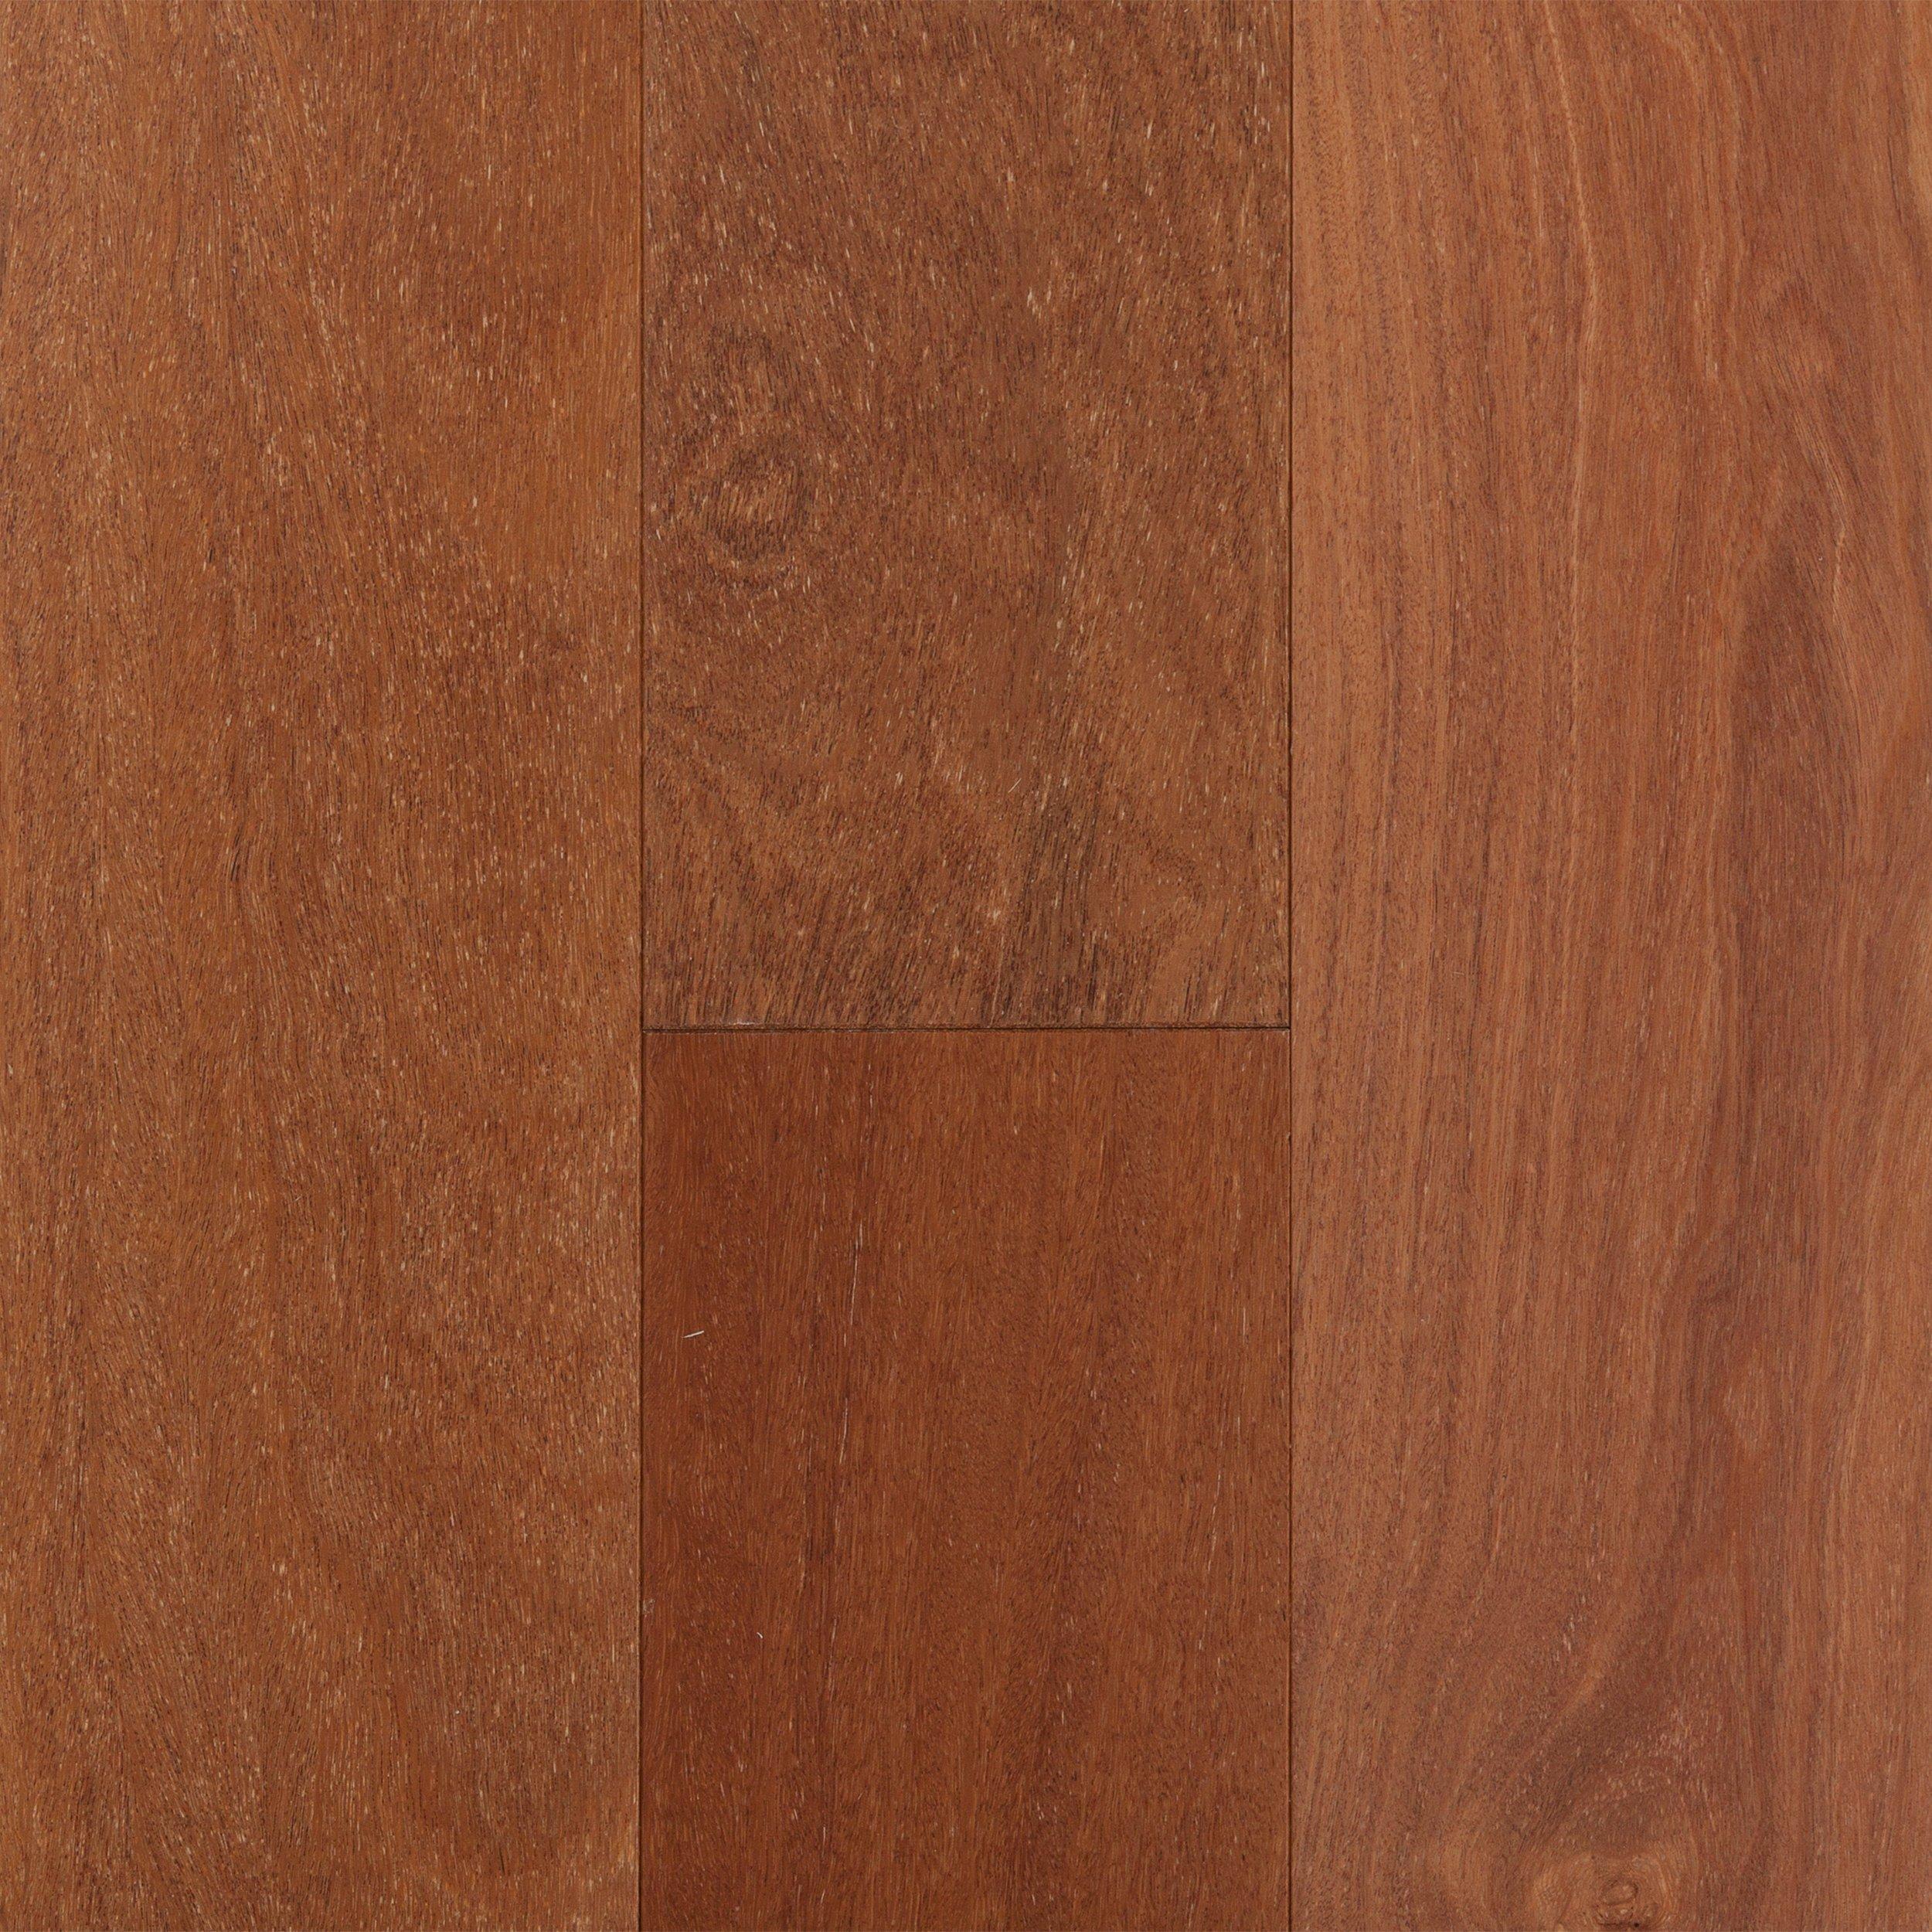 cumaru brazilian teak smooth locking engineered hardwood 12in x 4 34in floor and decor